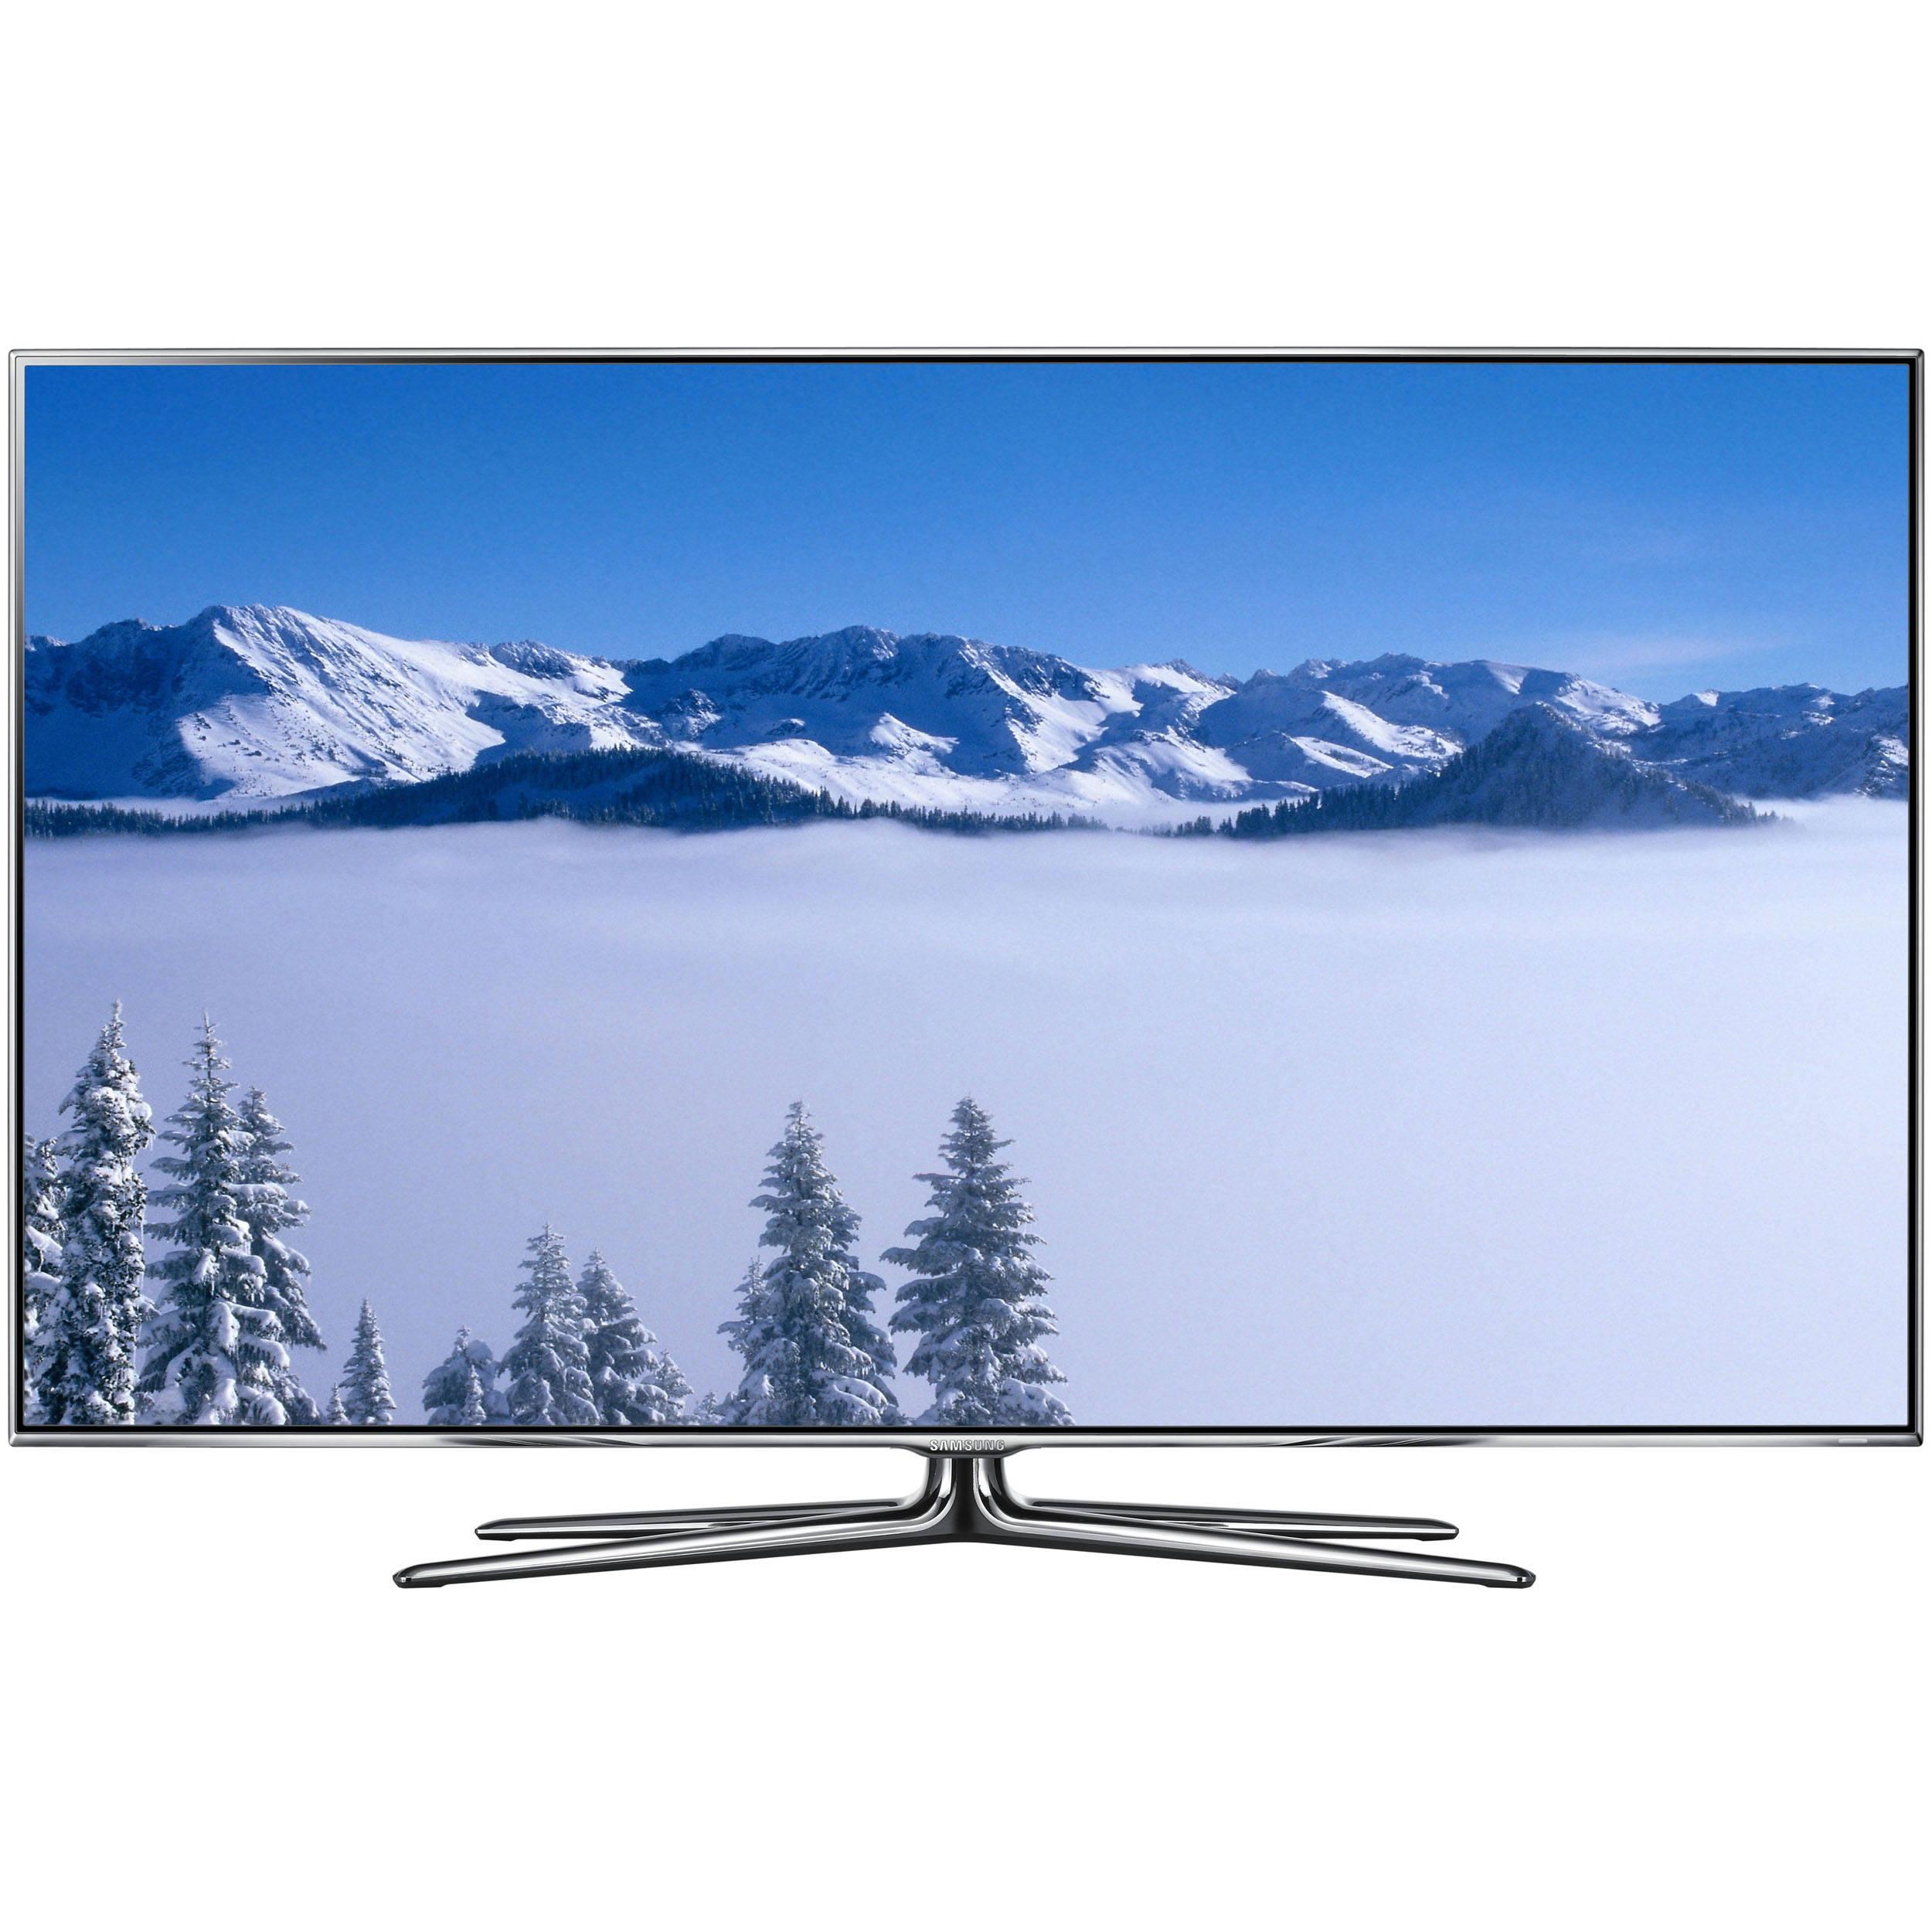 samsung un55d8000 55 3d led hdtv un55d8000yfxza b h photo. Black Bedroom Furniture Sets. Home Design Ideas